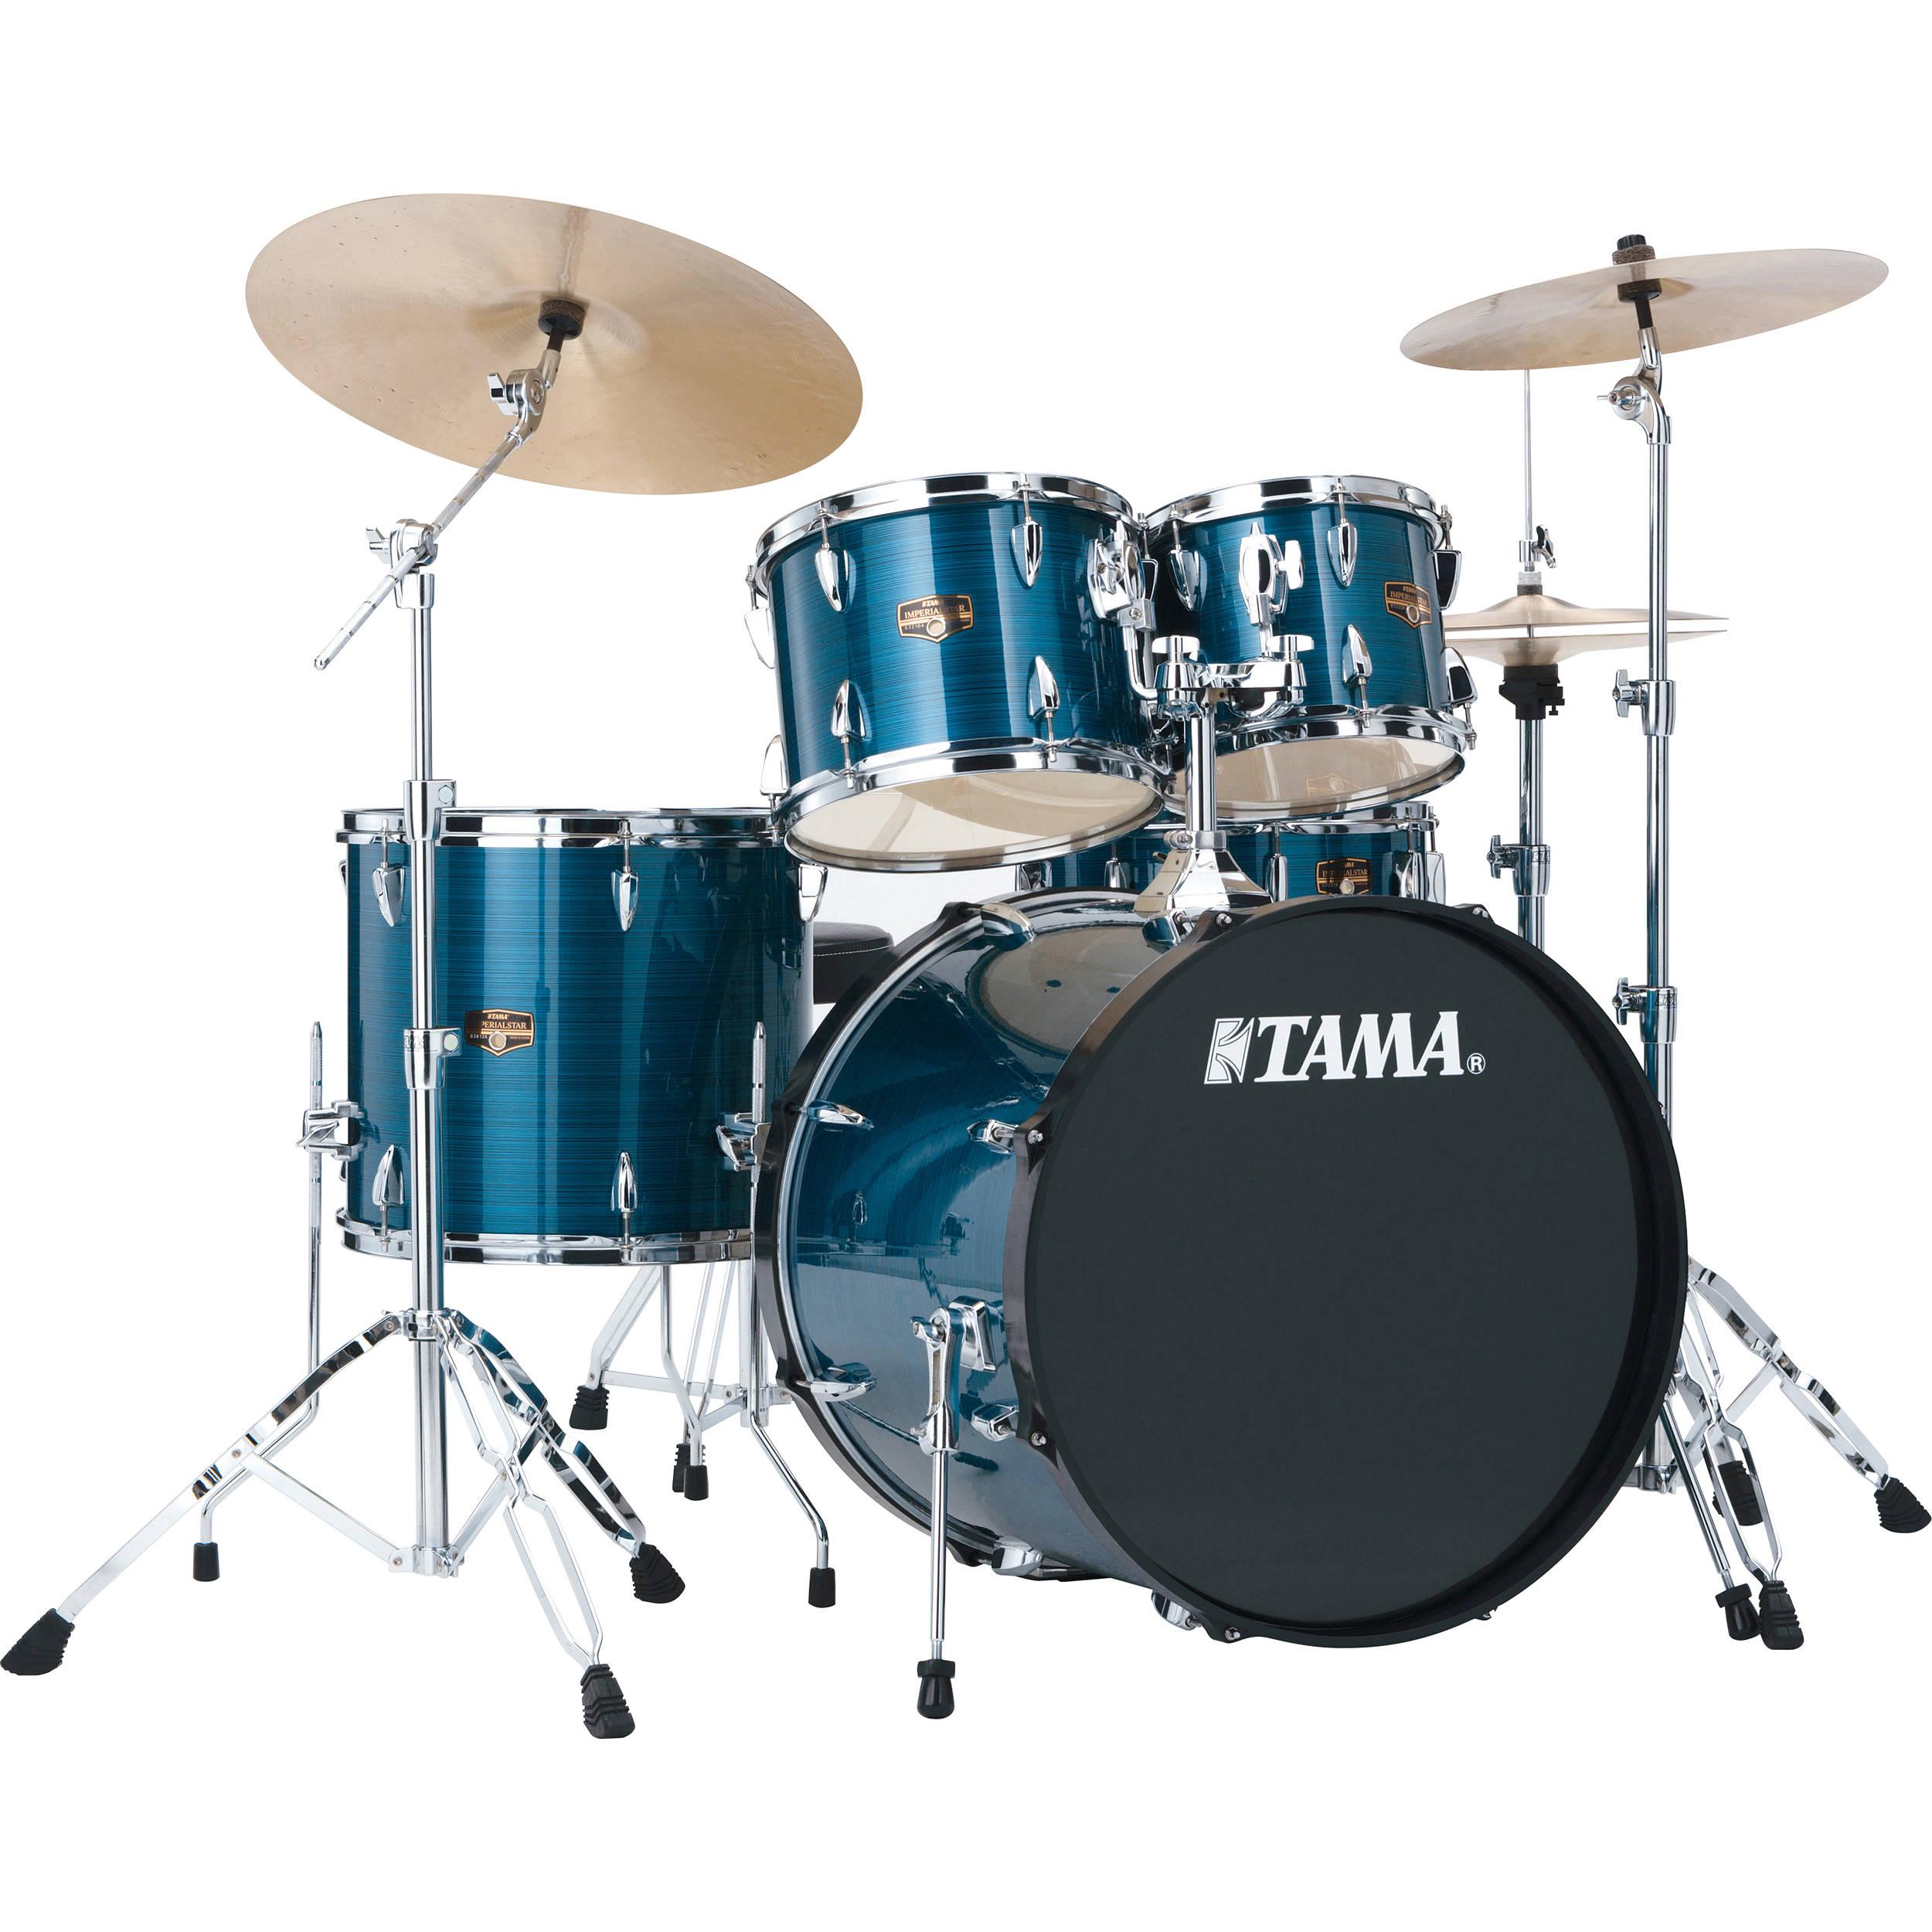 tama ip52kchlb imperialstar 5 piece drum set ip52kchlb b h photo. Black Bedroom Furniture Sets. Home Design Ideas